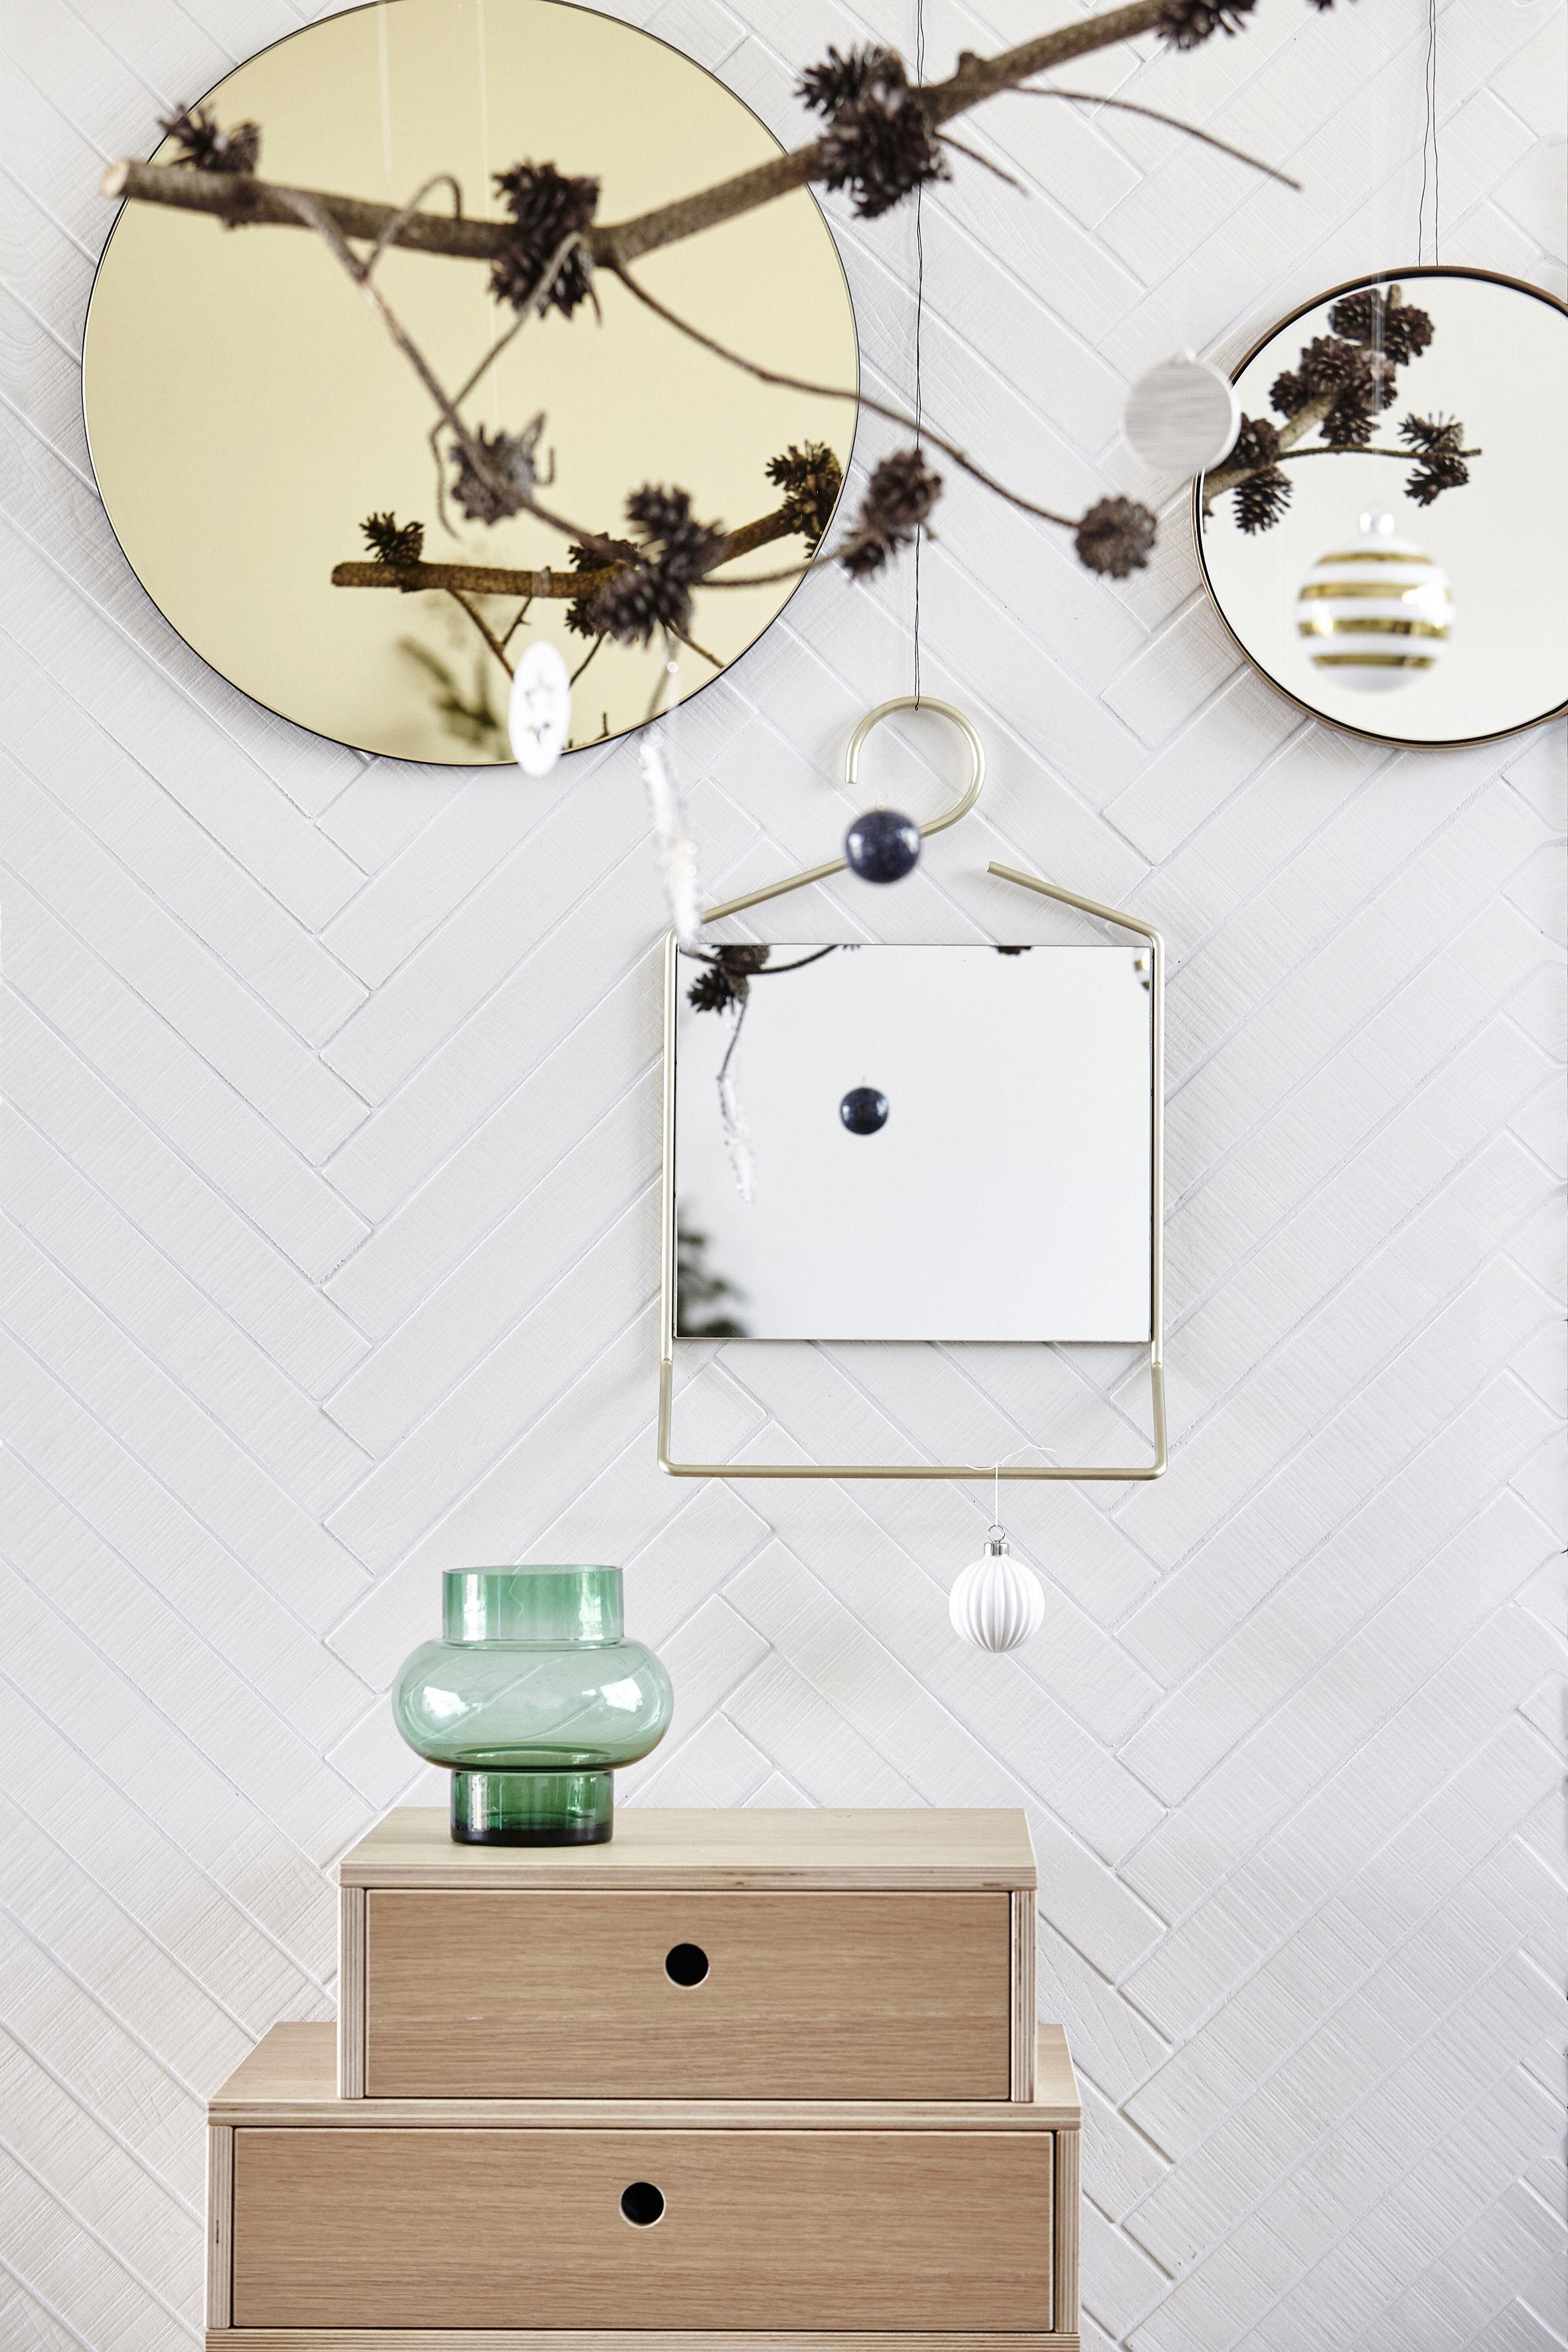 miroir mural hang porte serviettes int gr h 50 cm laiton house doctor. Black Bedroom Furniture Sets. Home Design Ideas